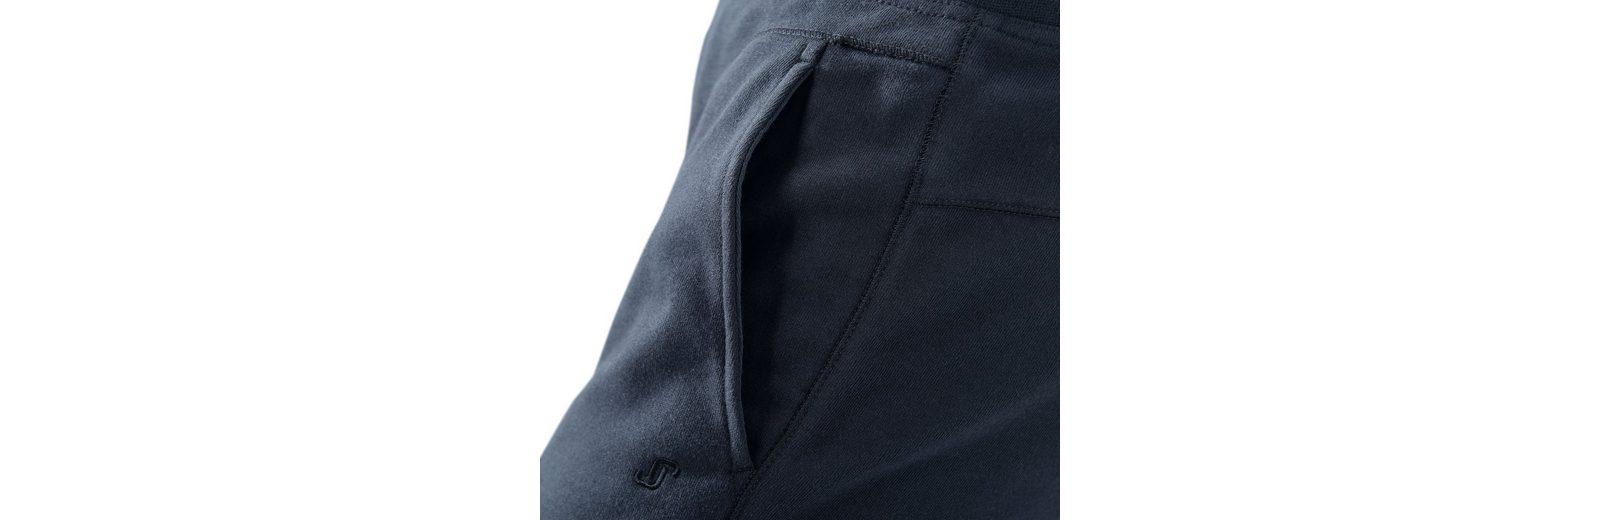 Joy Sportswear Caprihose SINEAD Outlet Brandneue Unisex 1DHz8p1X